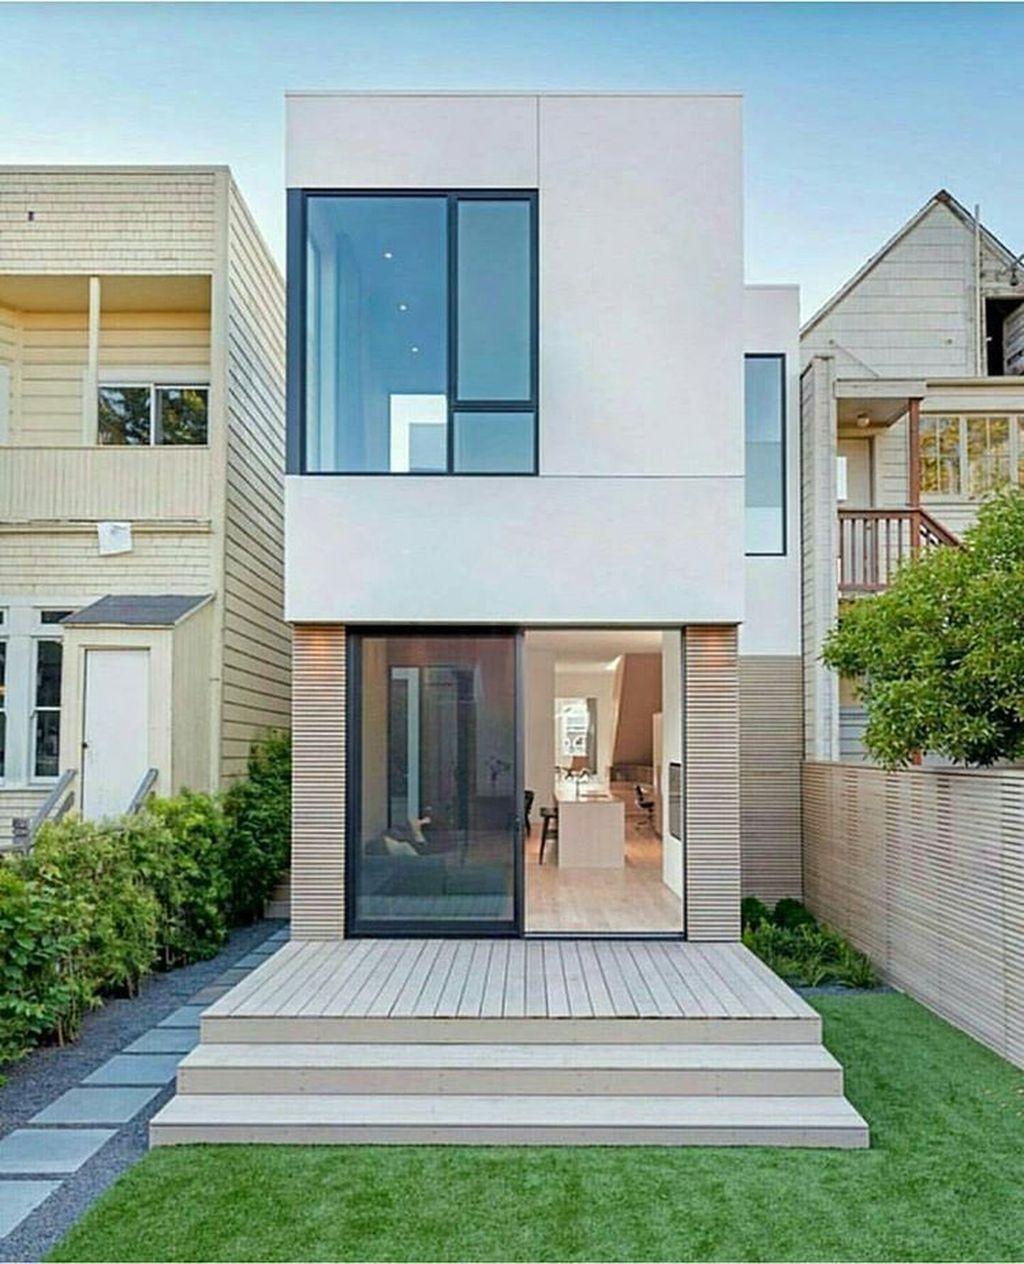 33 Stunning Small House Design Ideas Magzhouse Modern Minimalist House Narrow House Designs Modern Small House Design